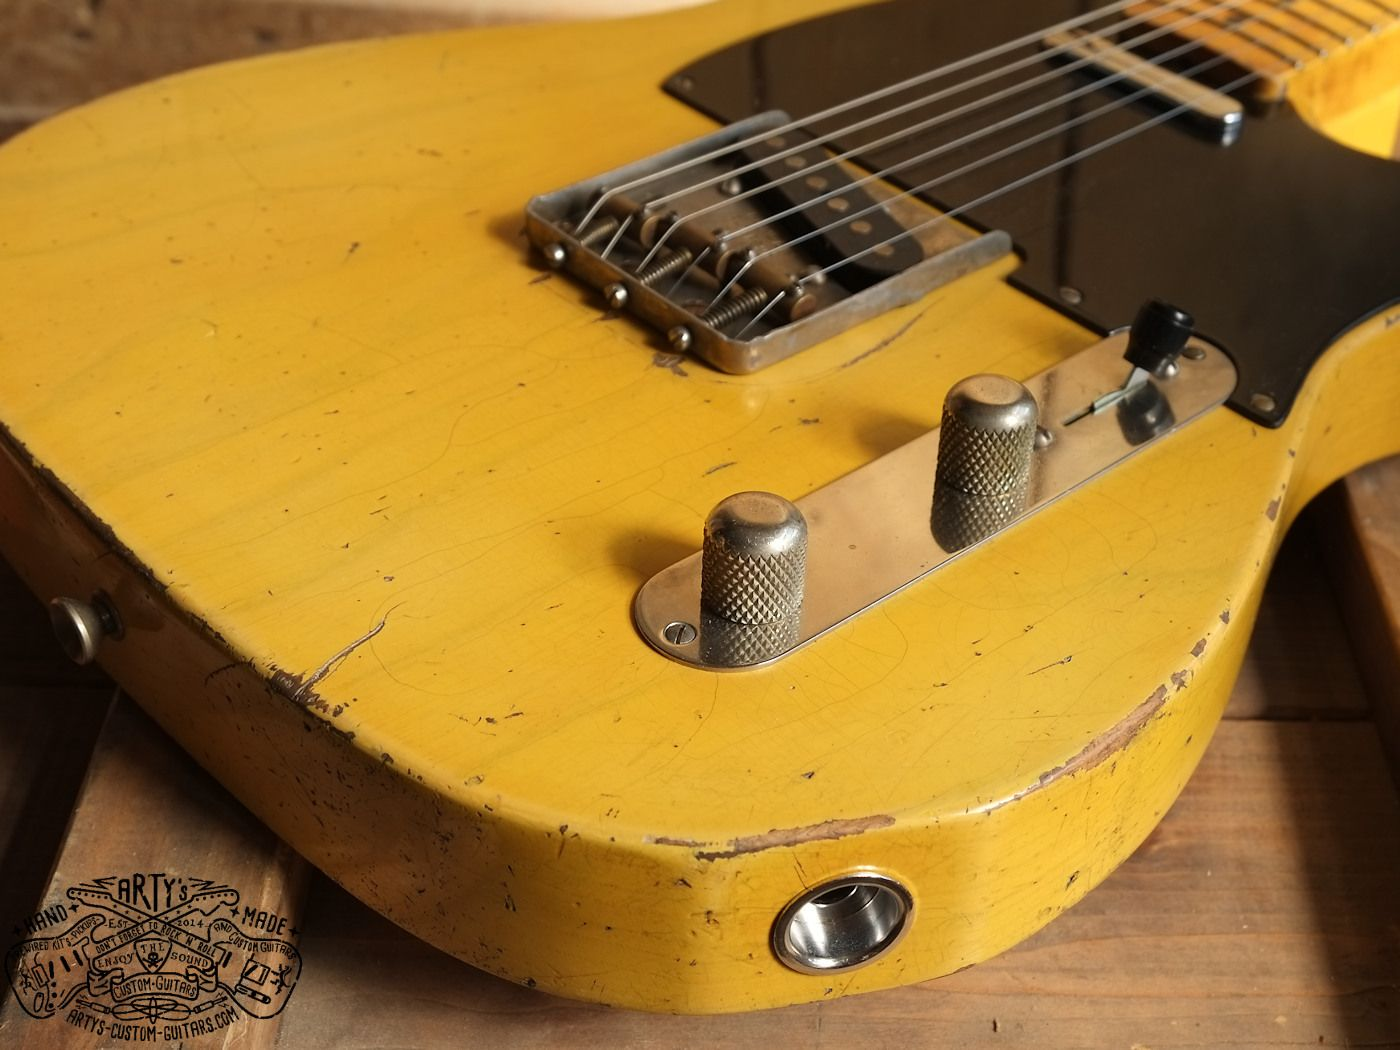 Nocaster 1950 Arty S Relic Repro Broadcaster Blackguard Tele Telecaster Arty S Custom Guitars Fender Guitars Fender Vintage Guitar